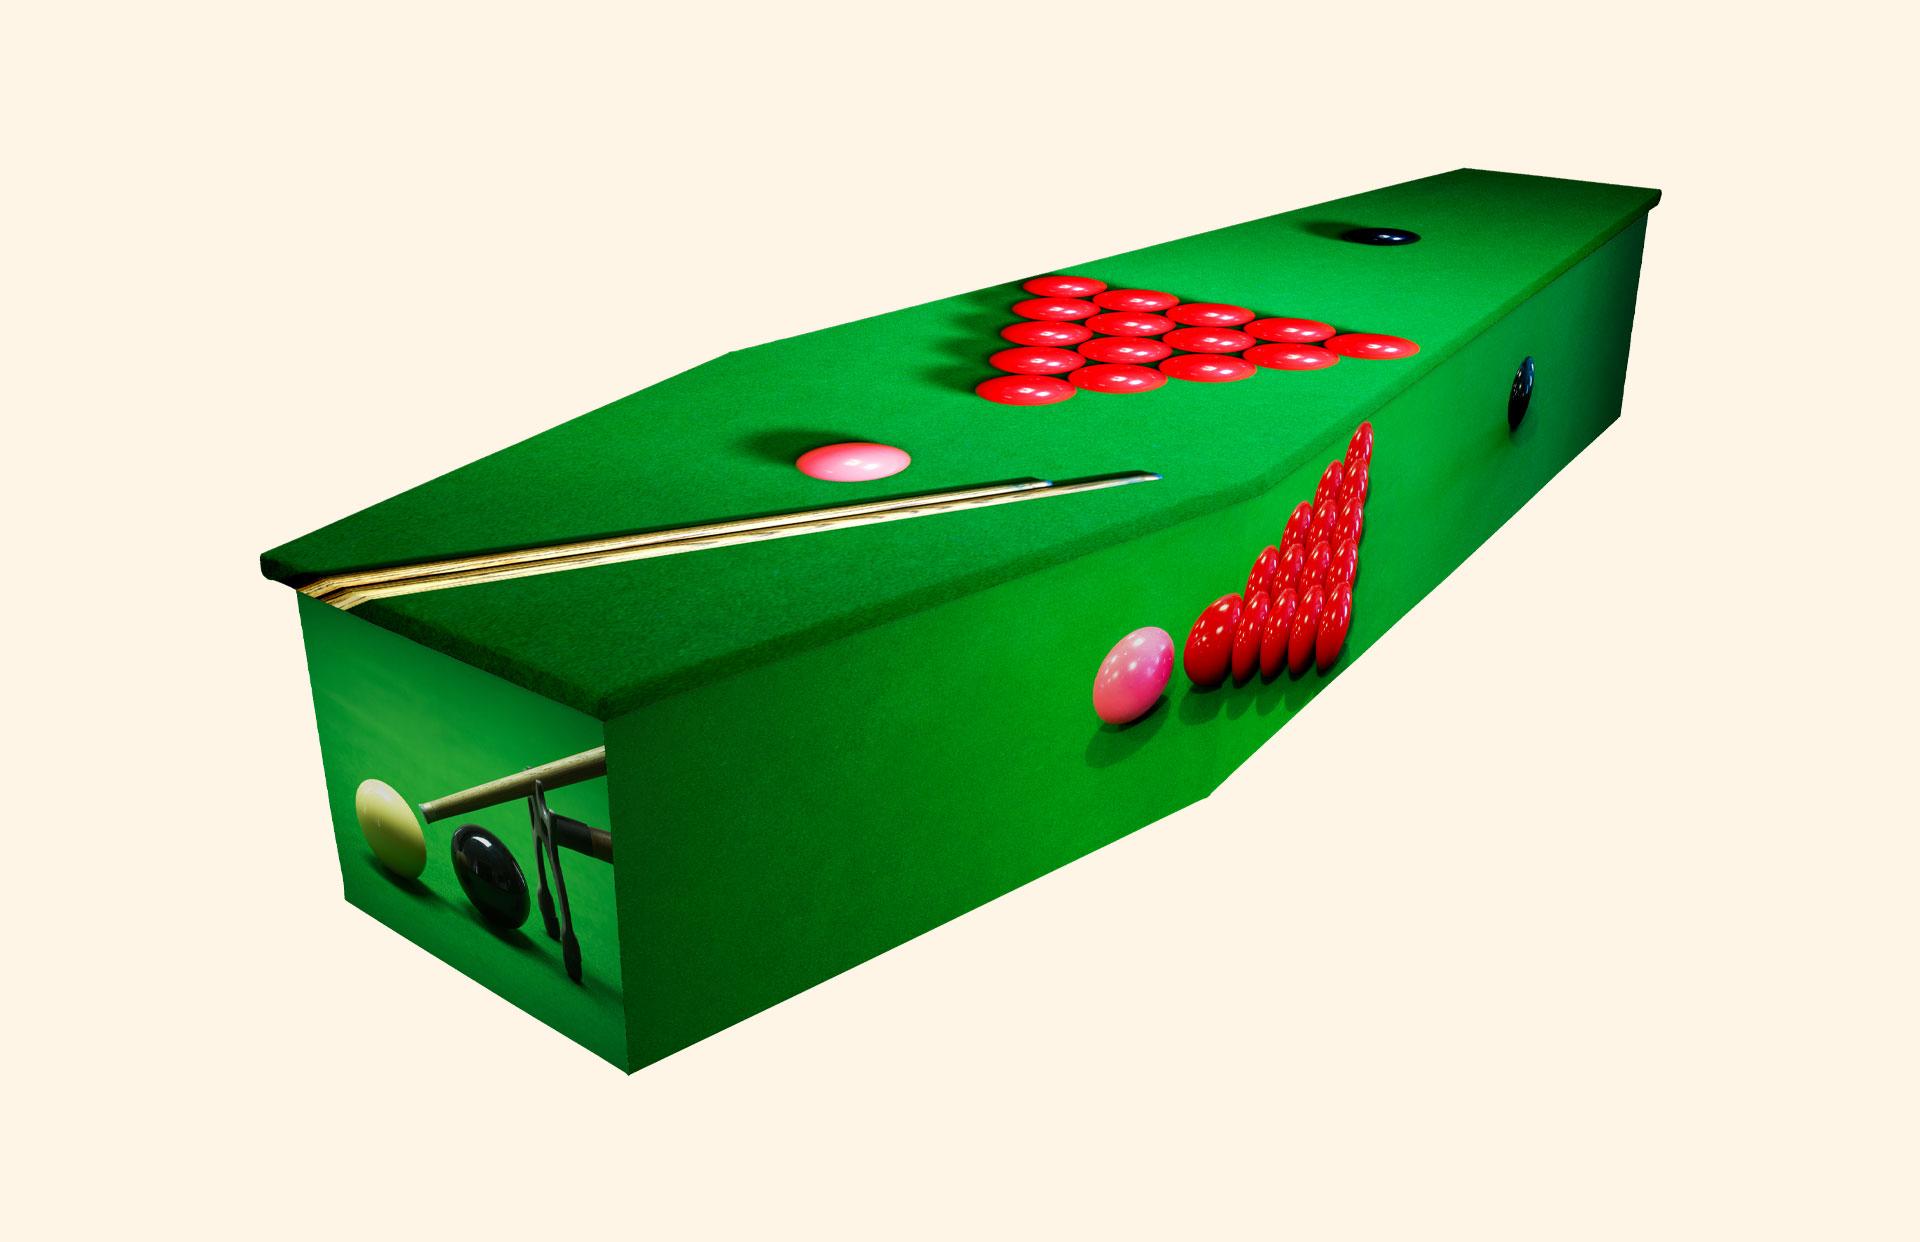 Snooker cardboard coffin